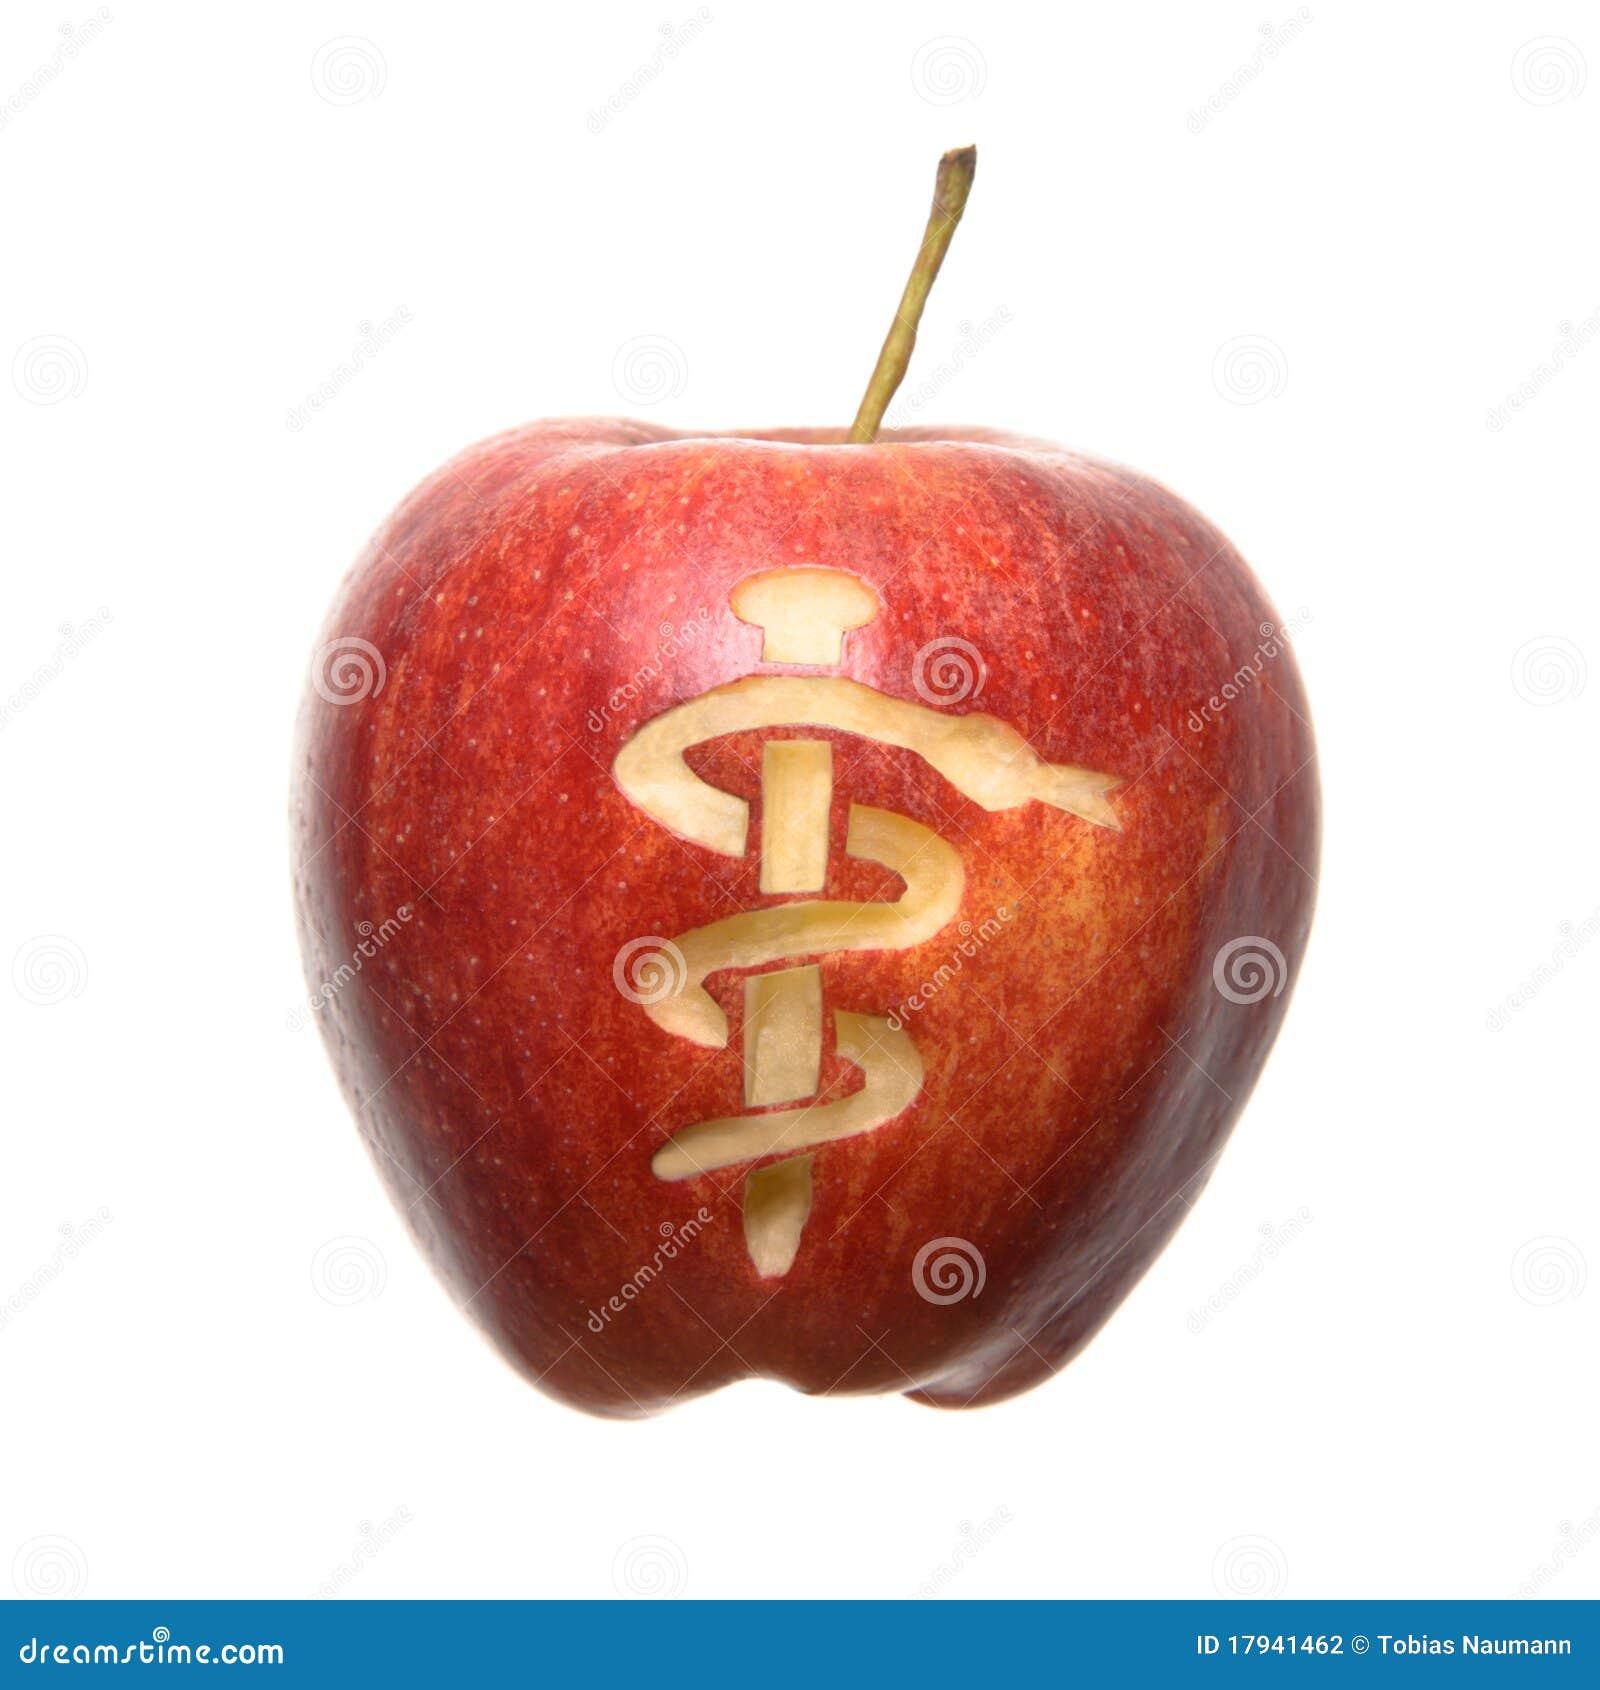 Apple Symbol Stock Photo Image Of Apple Background 17941462